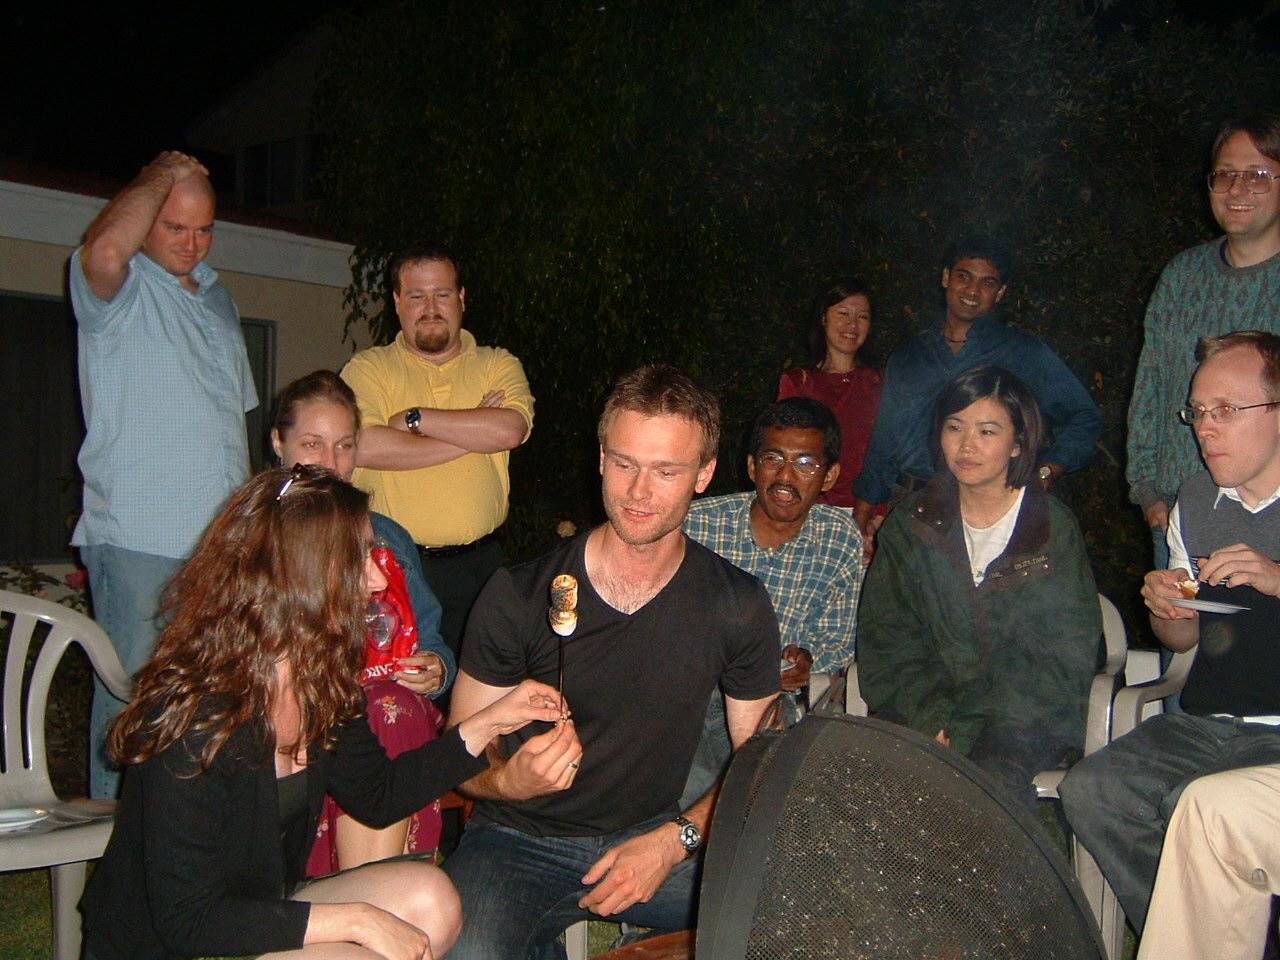 Teamcore Dinner 2004